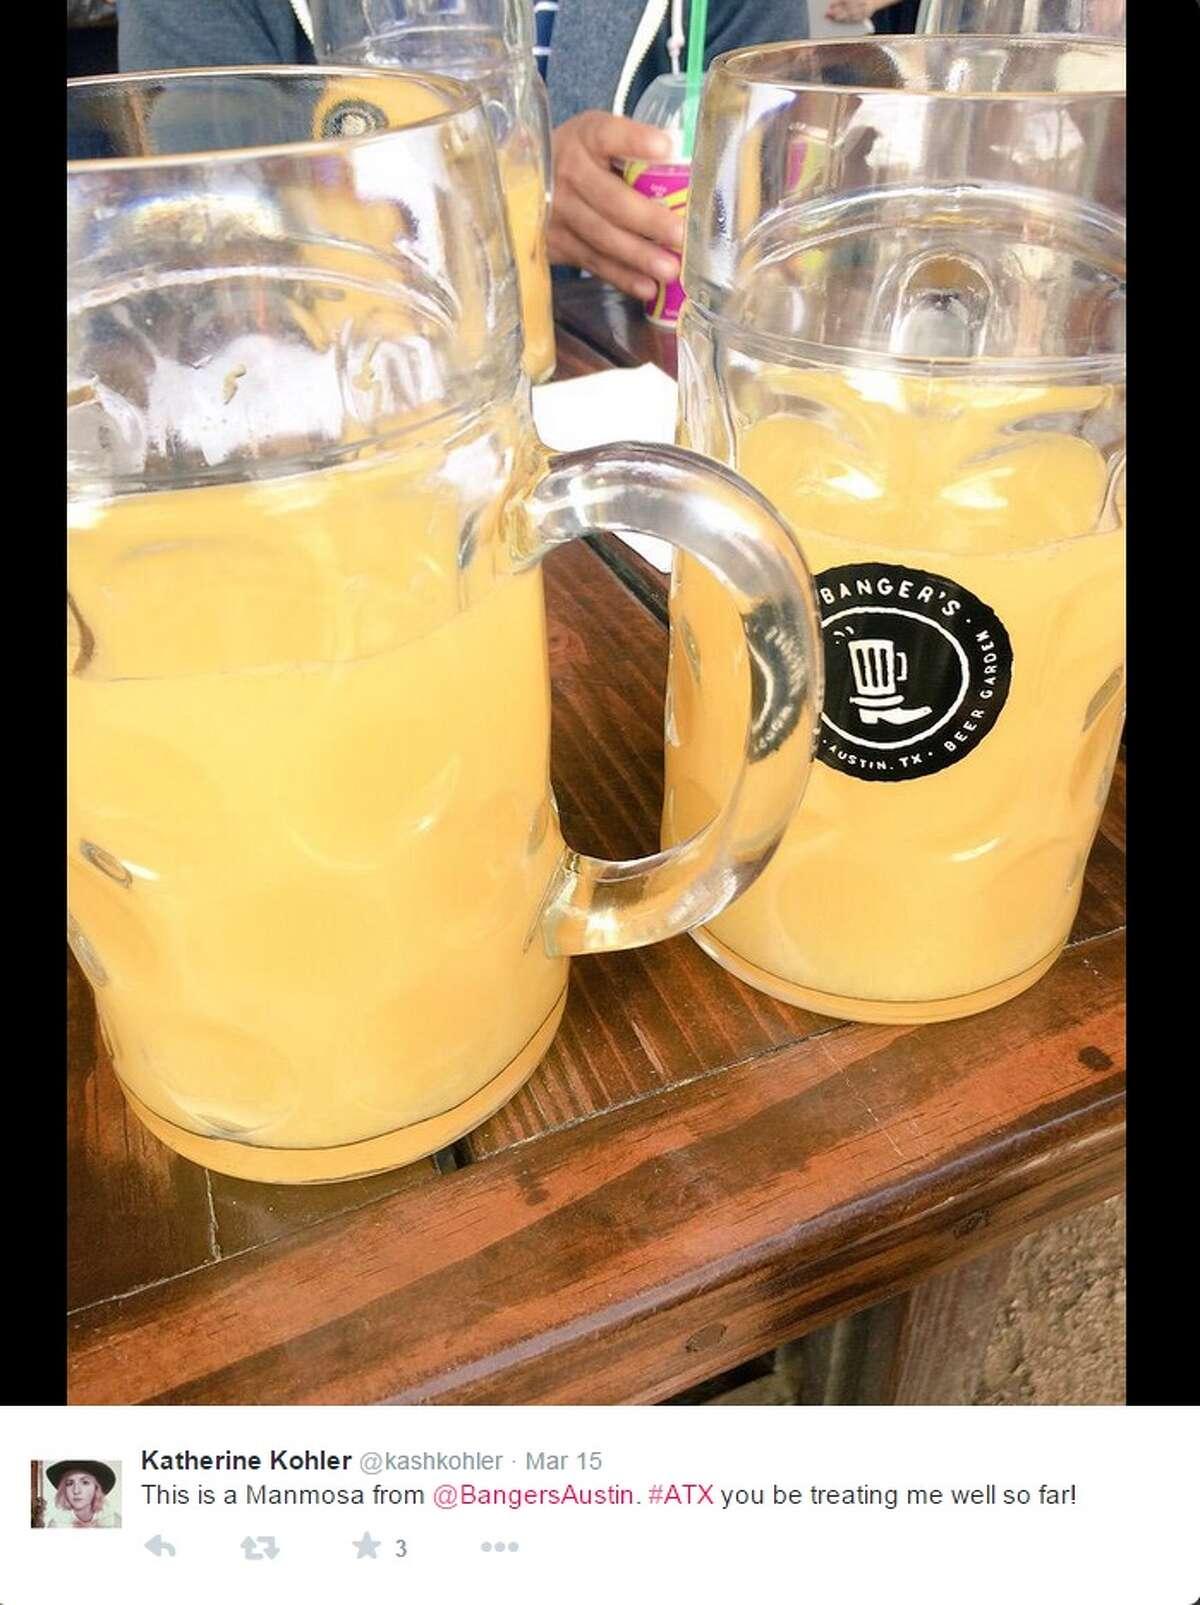 Manmosa Restaurant:Banger's Sausage House and Beer Garden, 79 Rainey Street, Austin Ingredients: 1 liter of champagne, with orange or cranberry juice Limit: 1